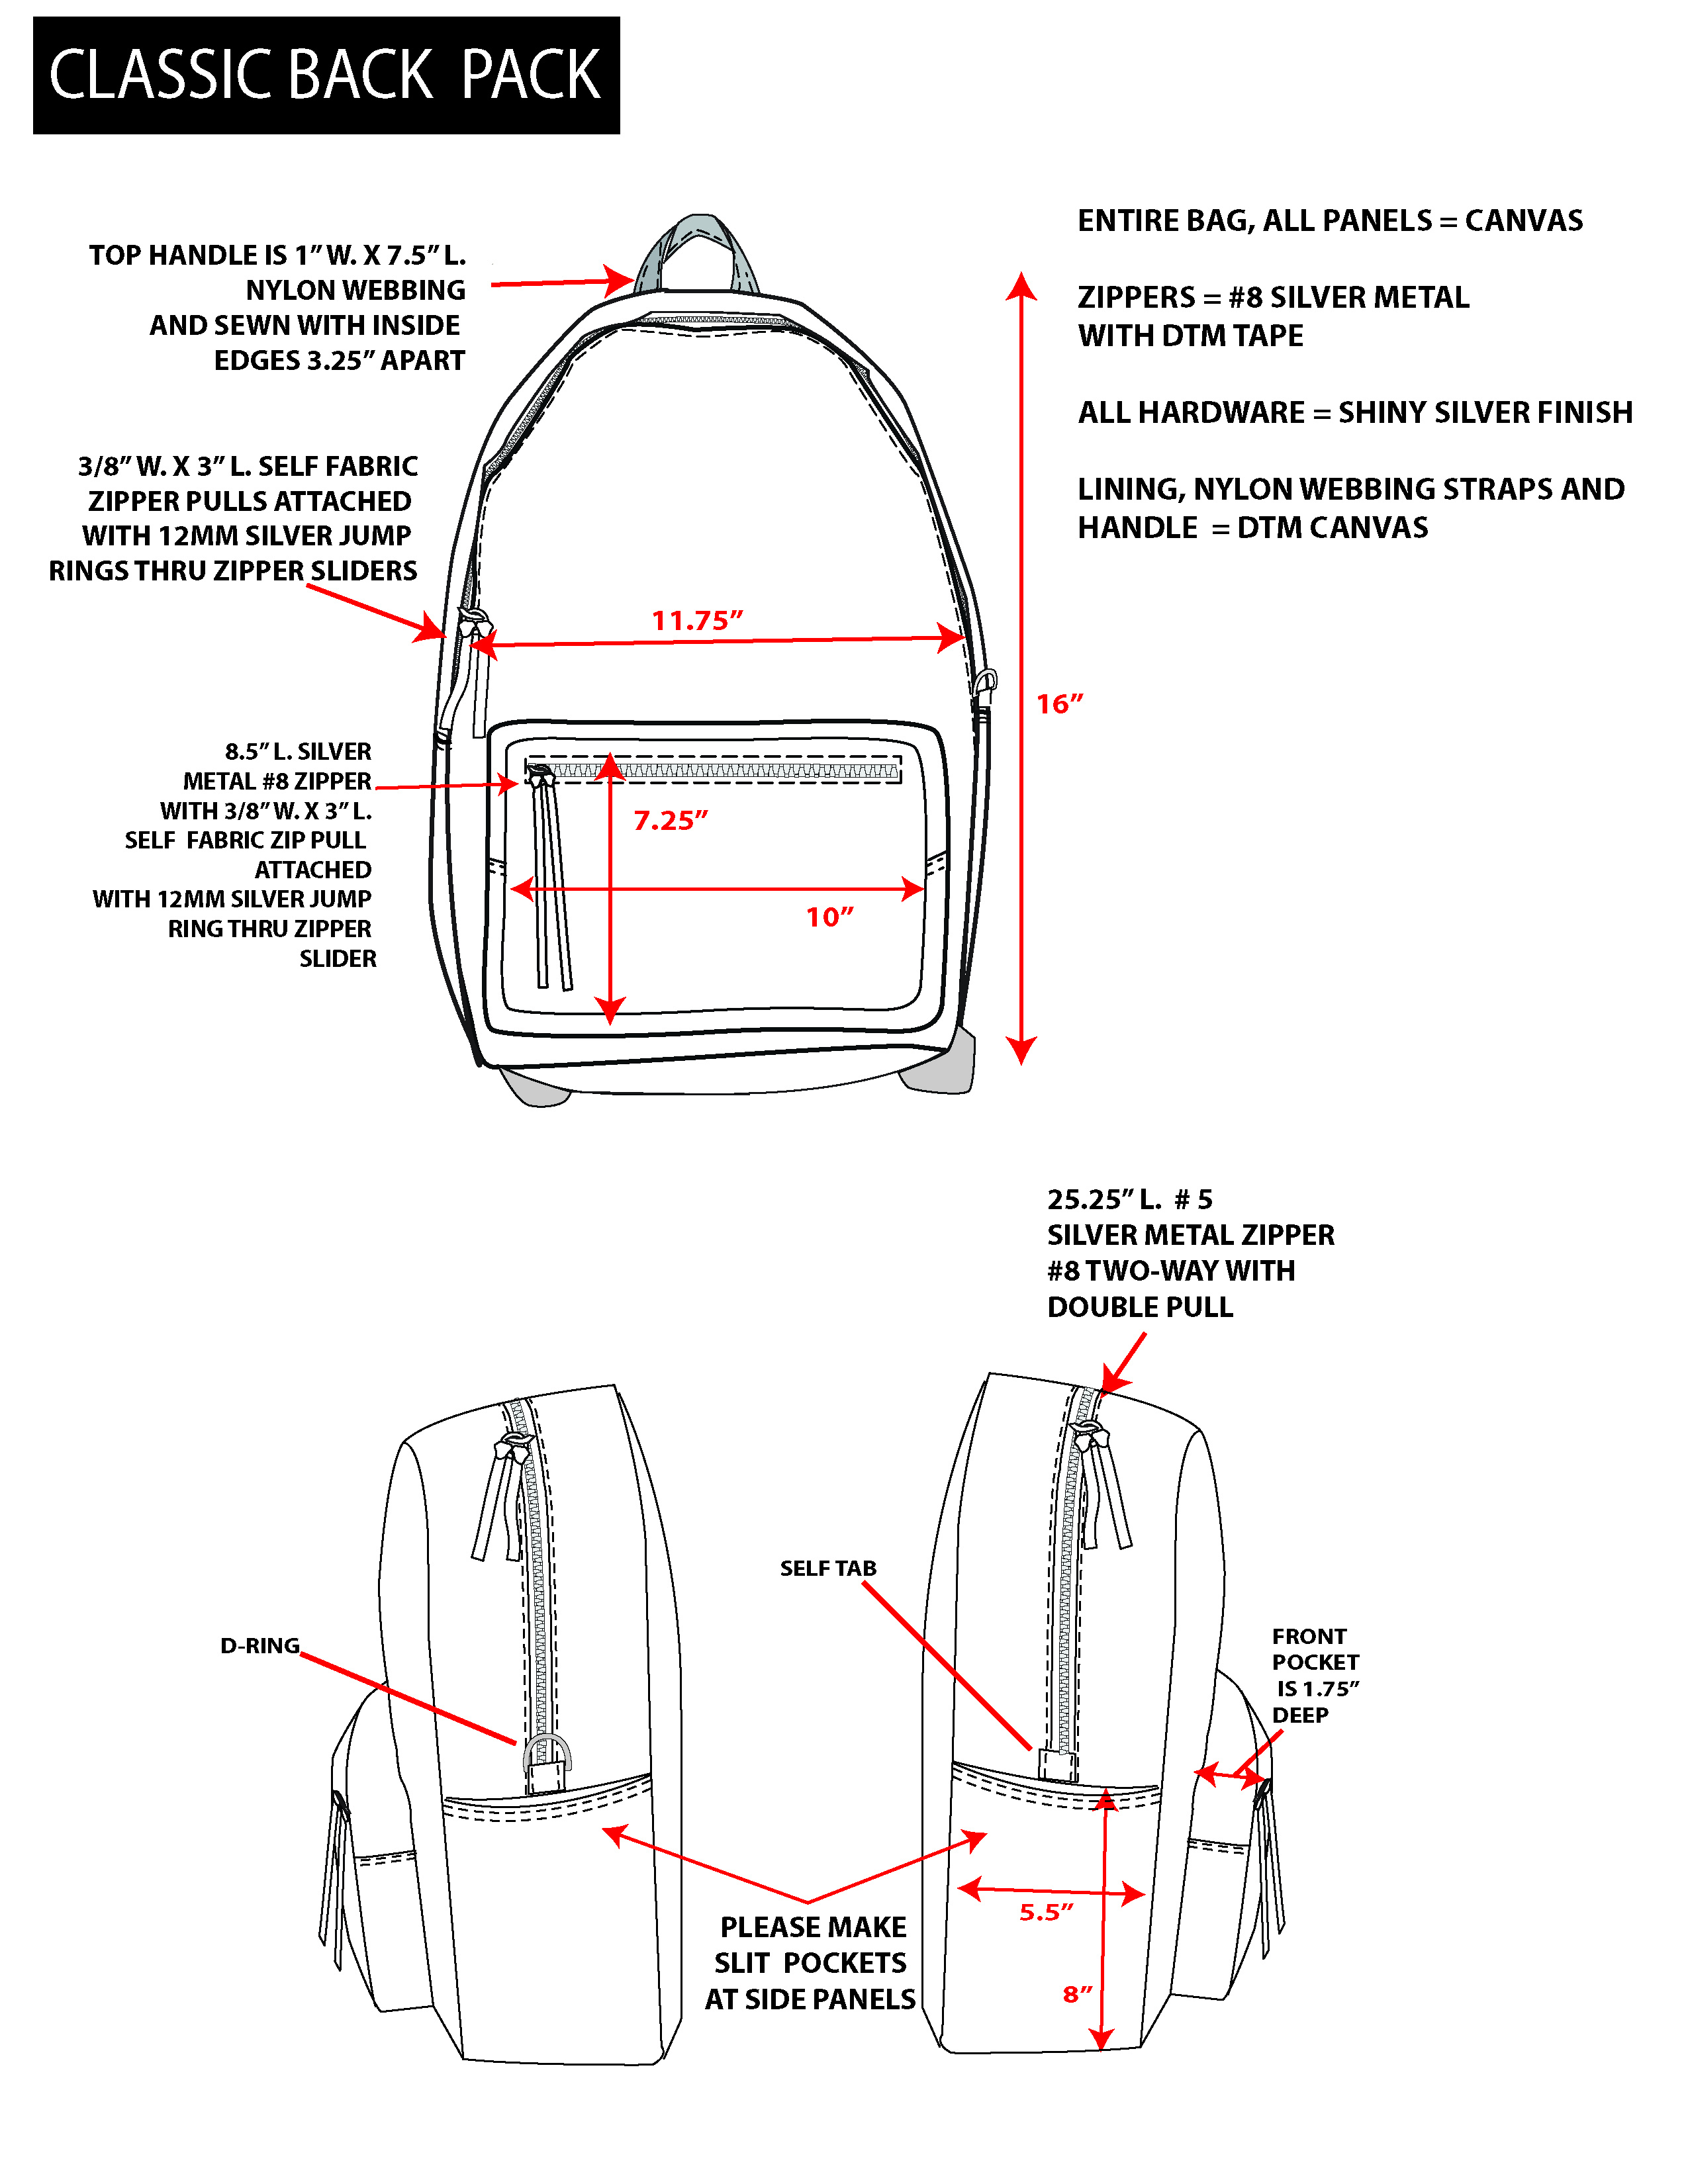 Back Pack Technical Sketch